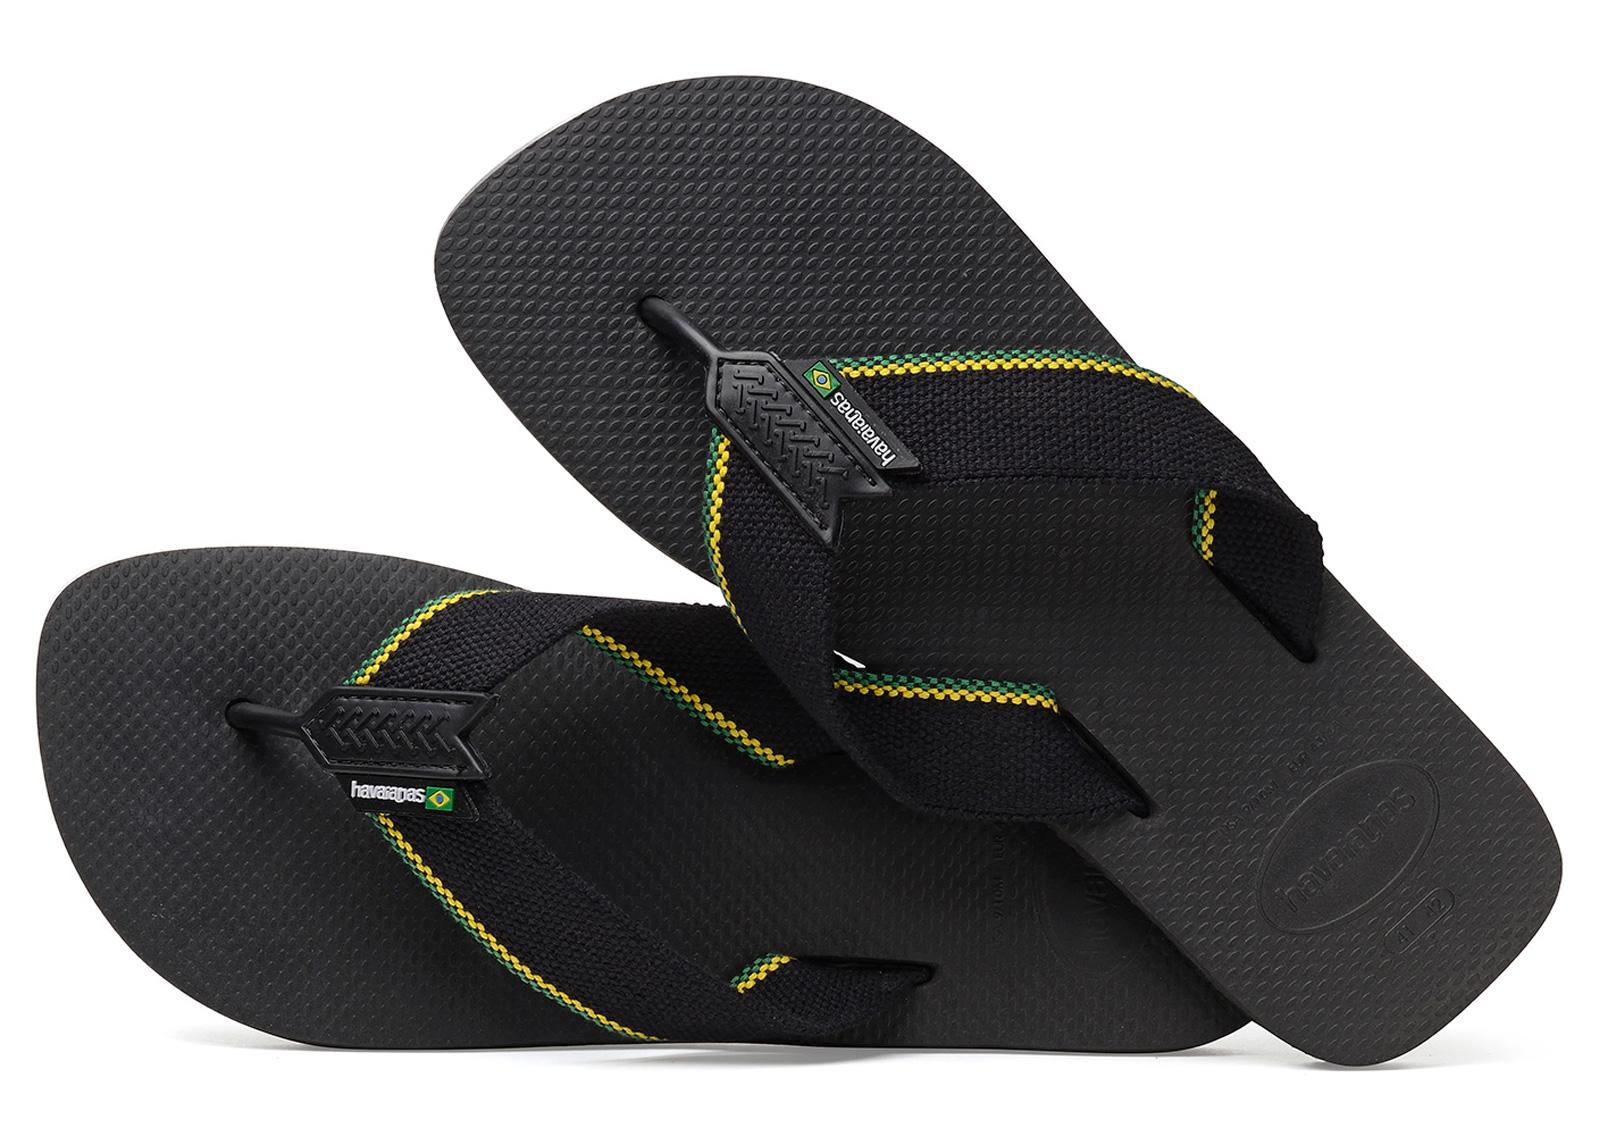 aace0966e212b Flip-Flops Urban Brasil Black - Brand Havaianas